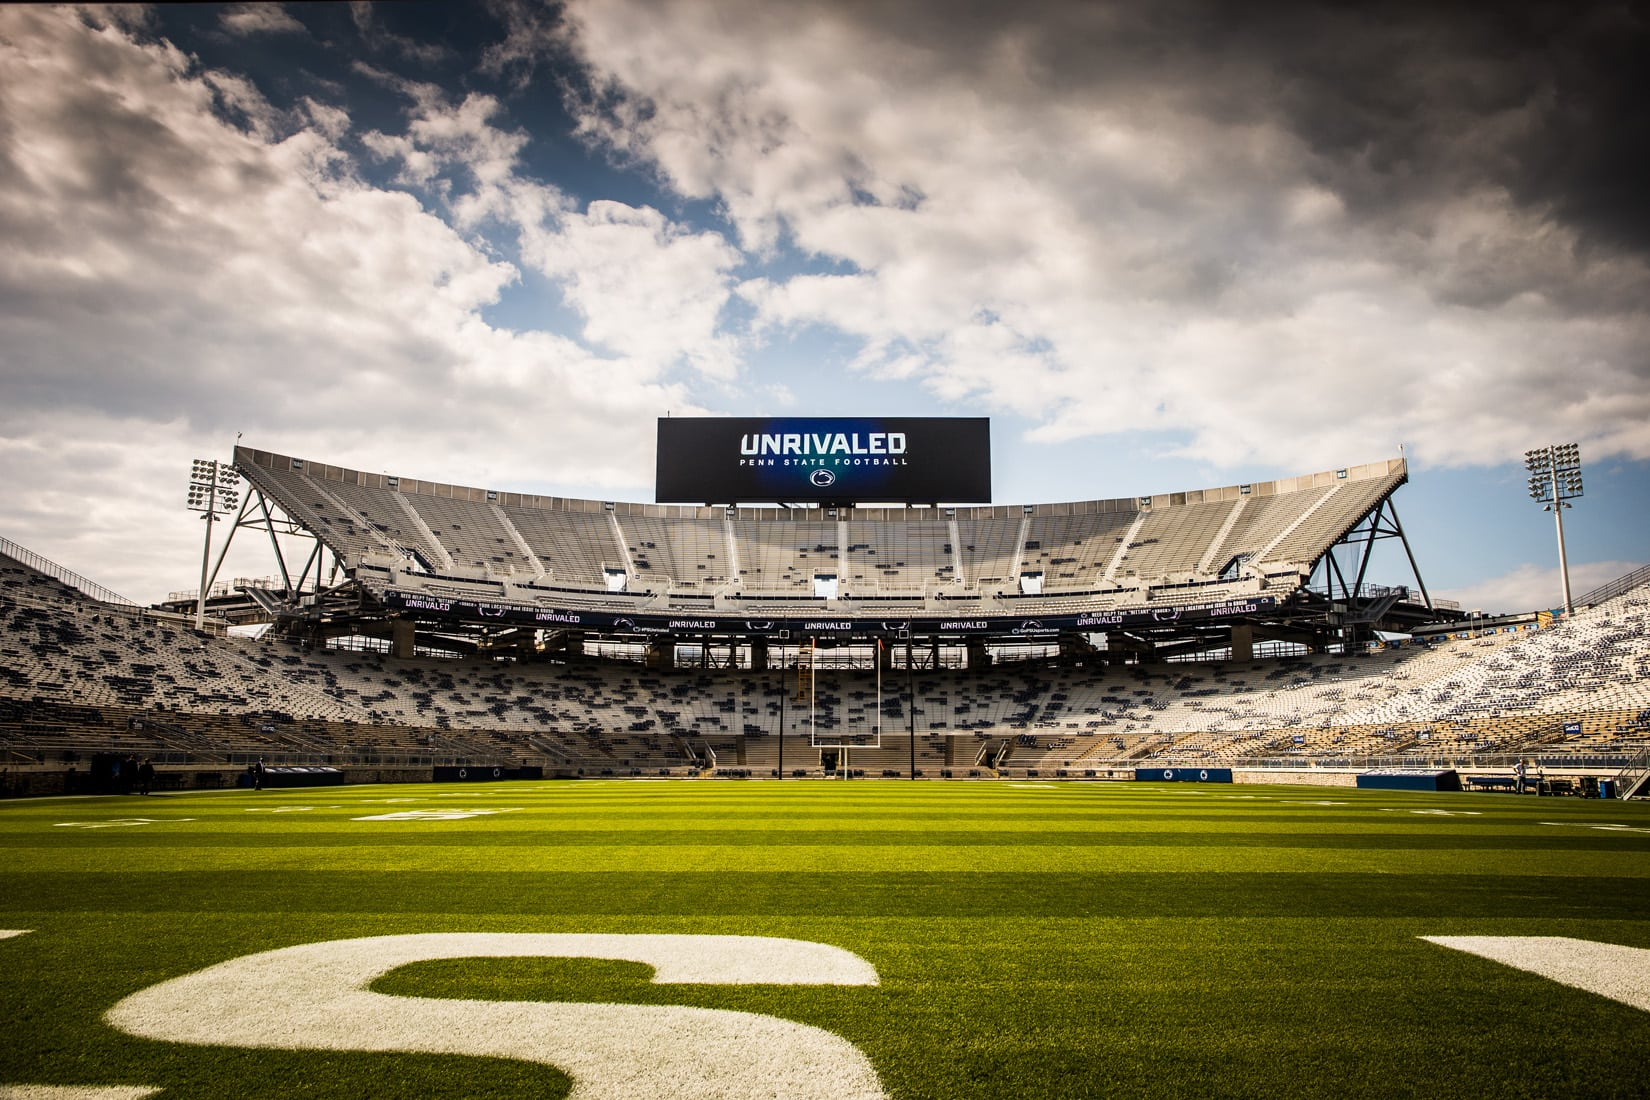 Penn State Beaver Stadium - Bob Lambert Photography, State College, PA